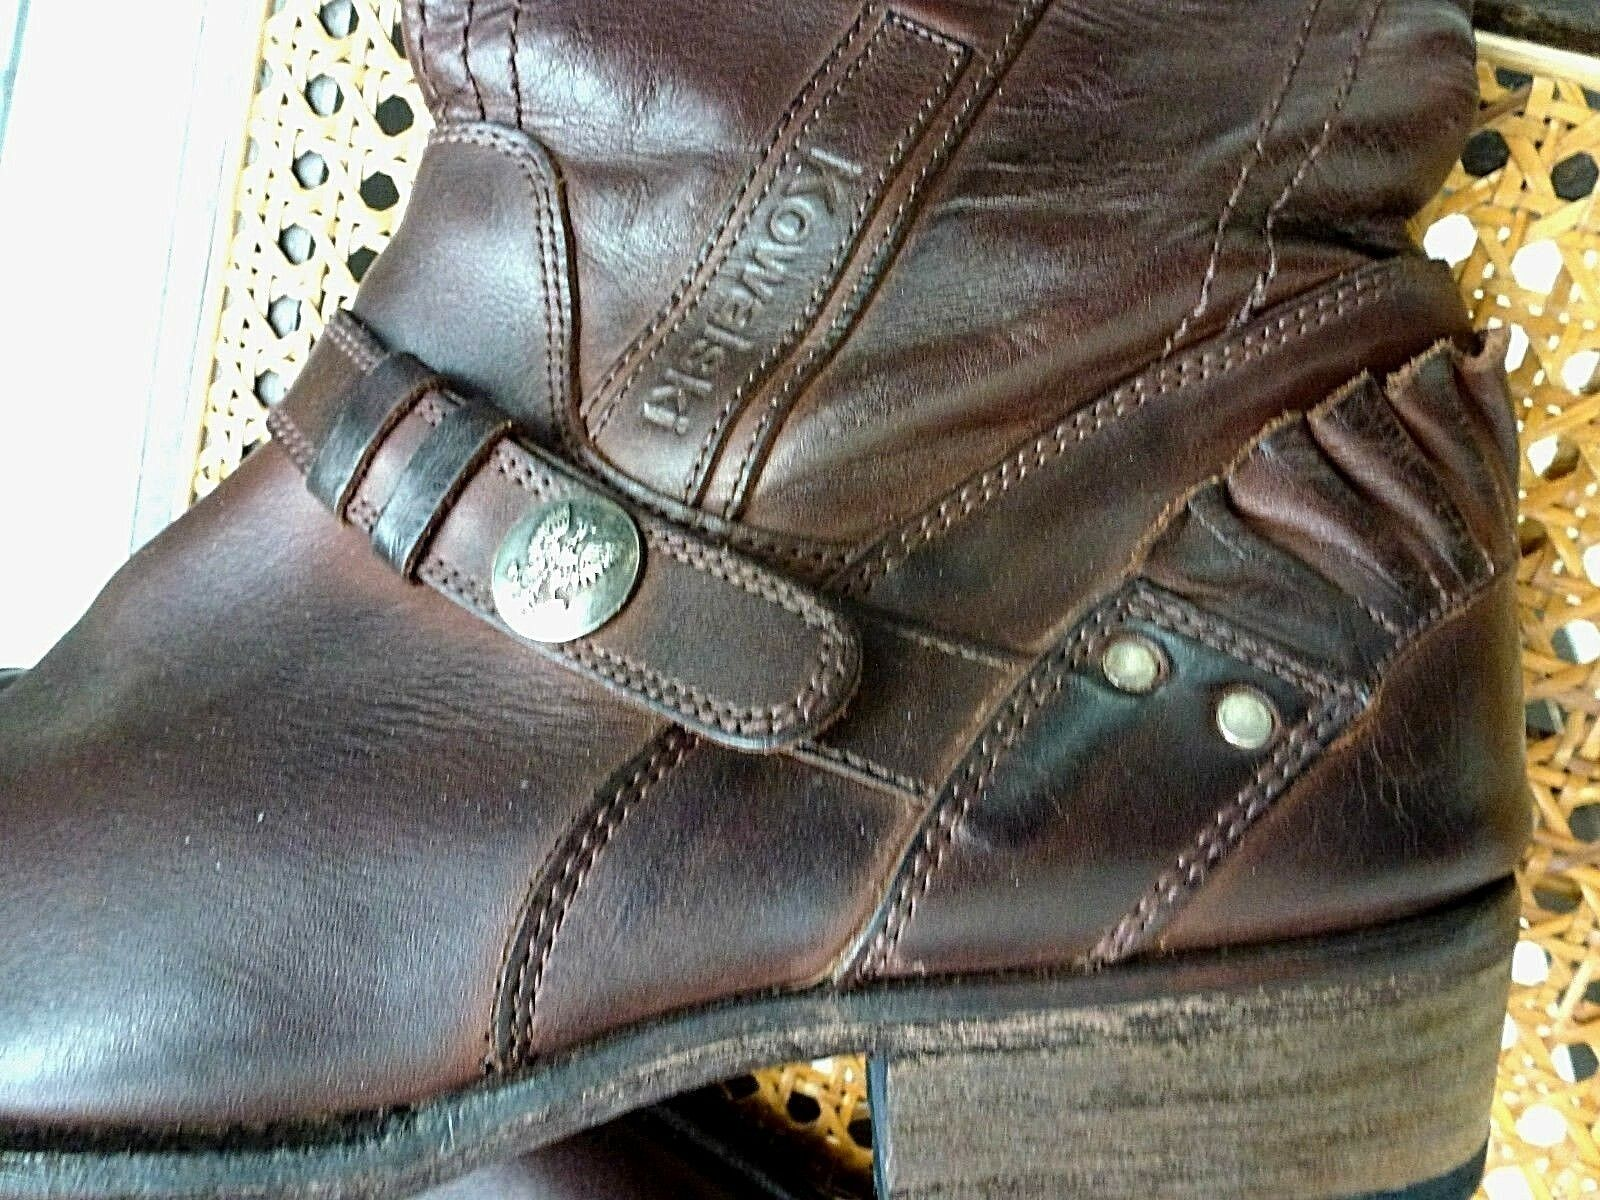 NEU* 42 *Kowalski*Herren Stiefel Boots Western Biker Schuh,USA Fans,Cognac Braun